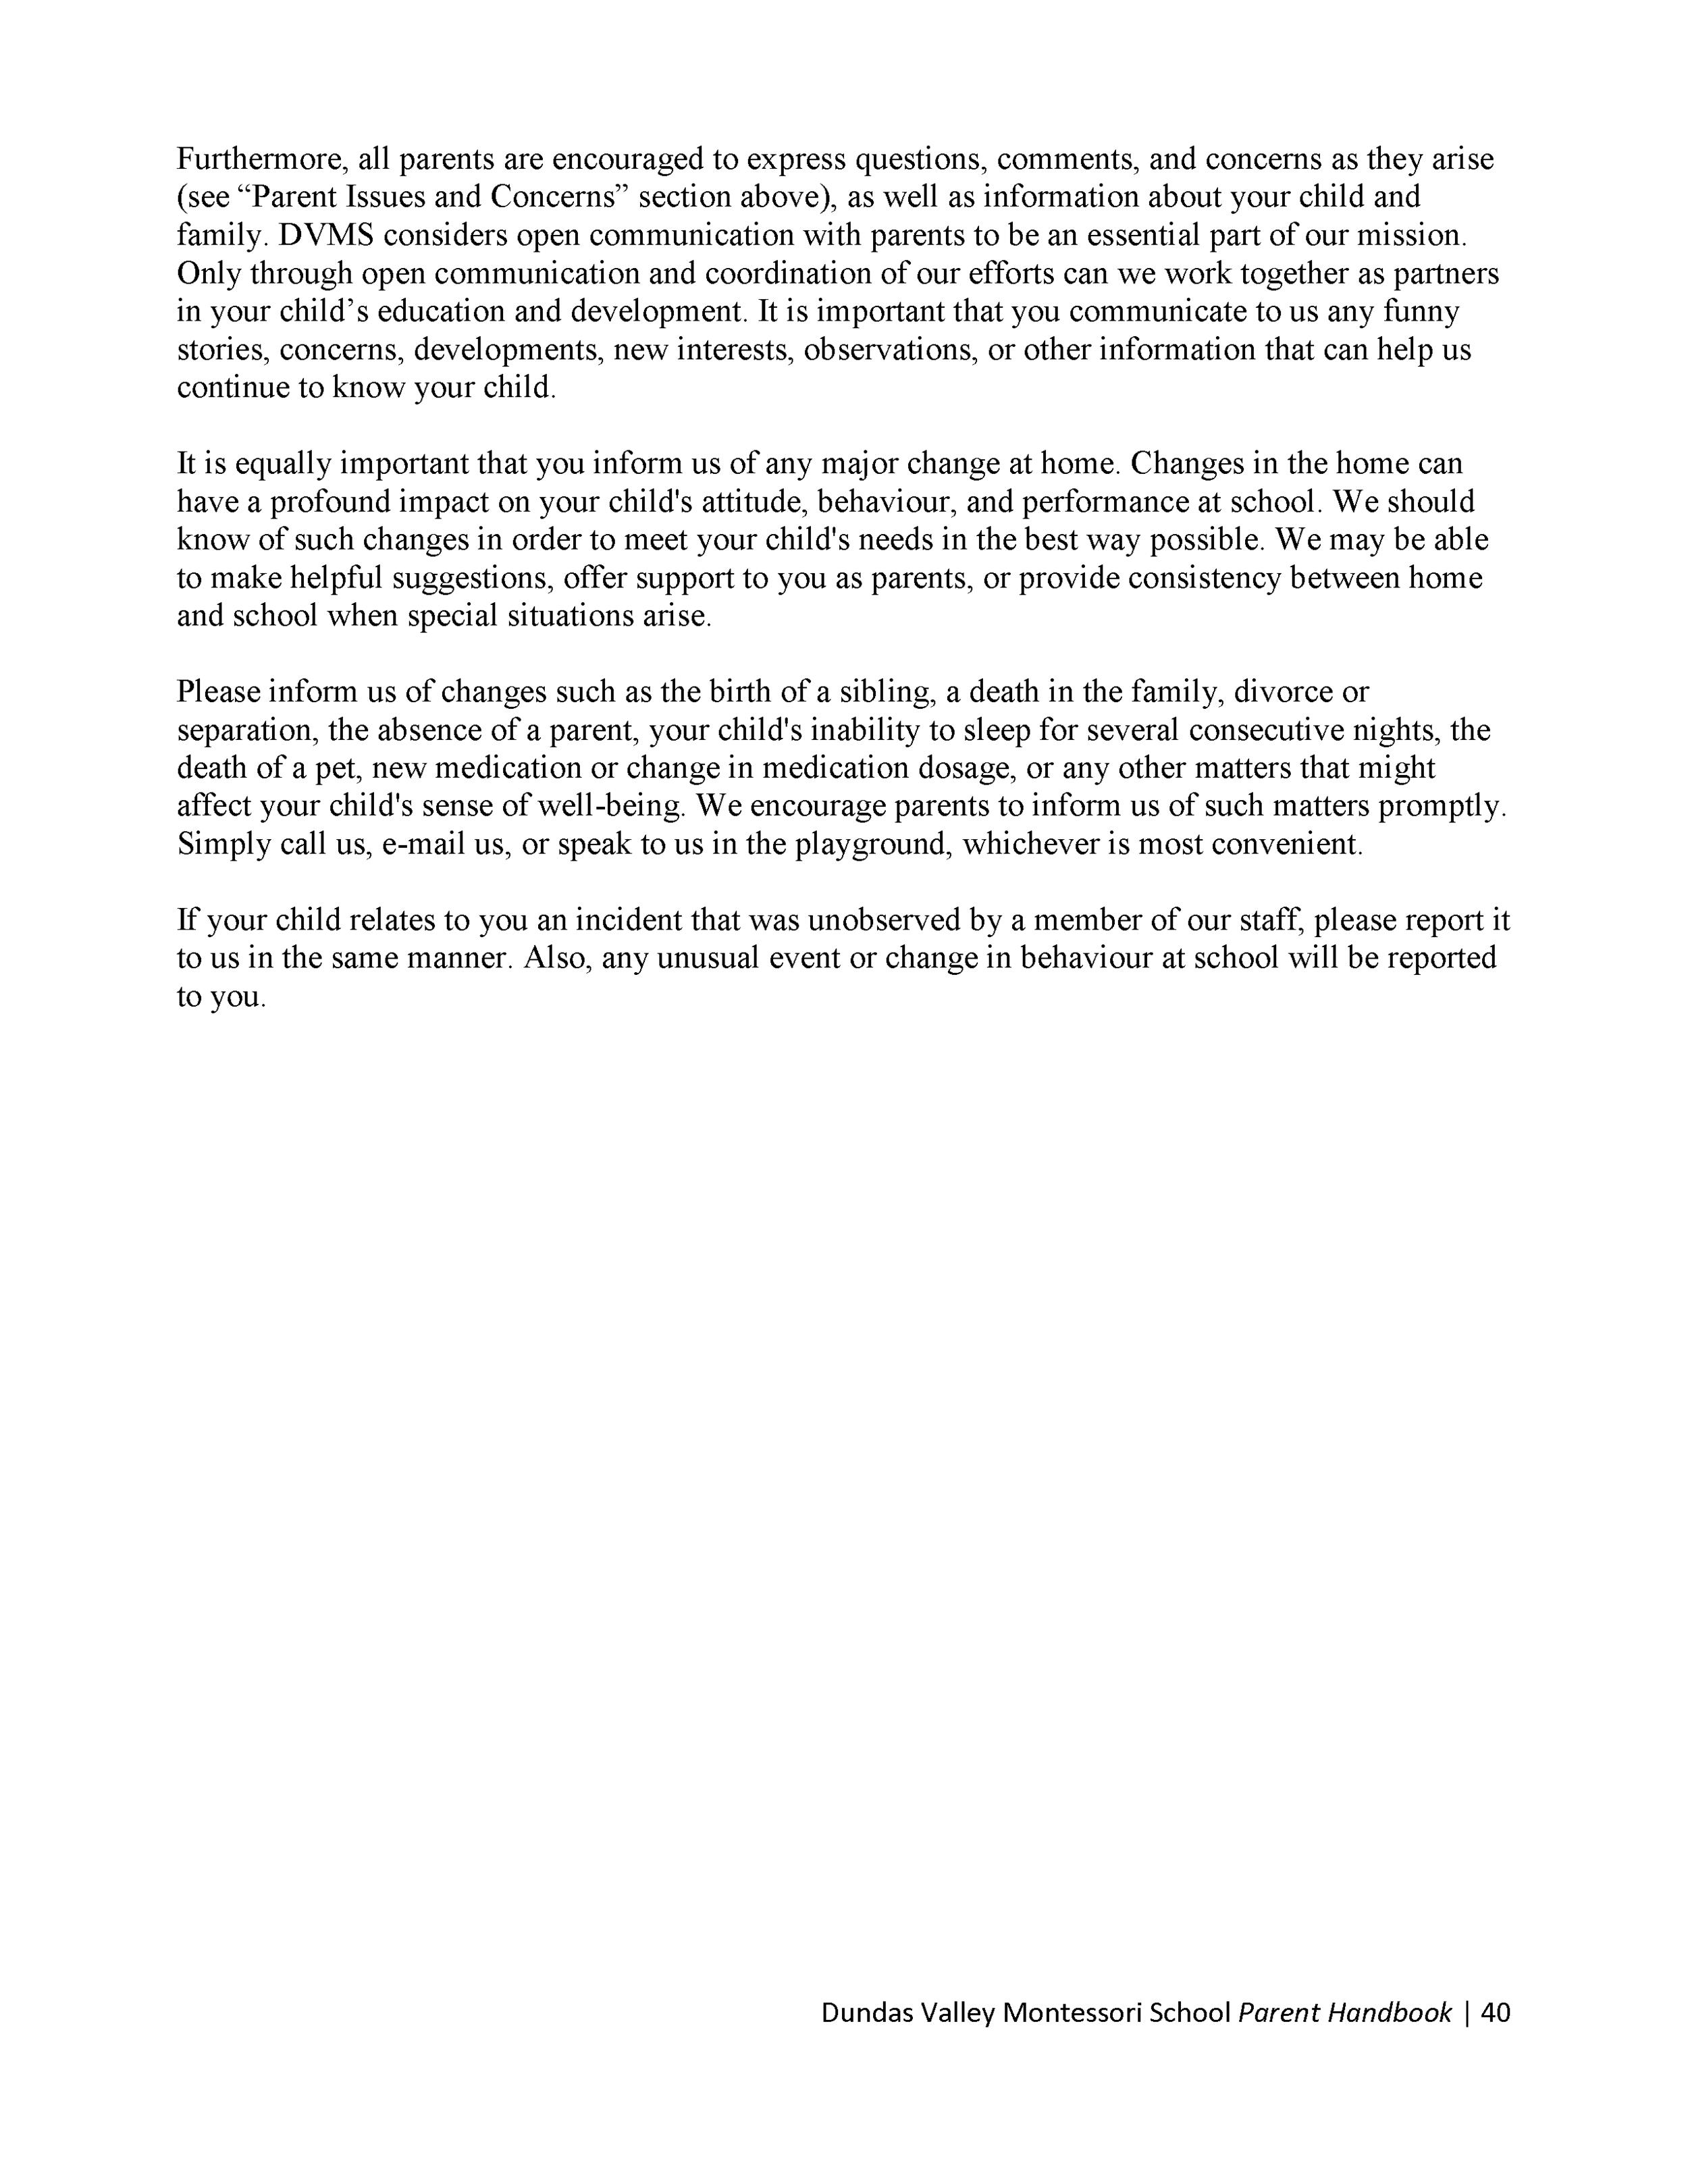 DVMS-Parent-Handbook-19-20_Page_042.png